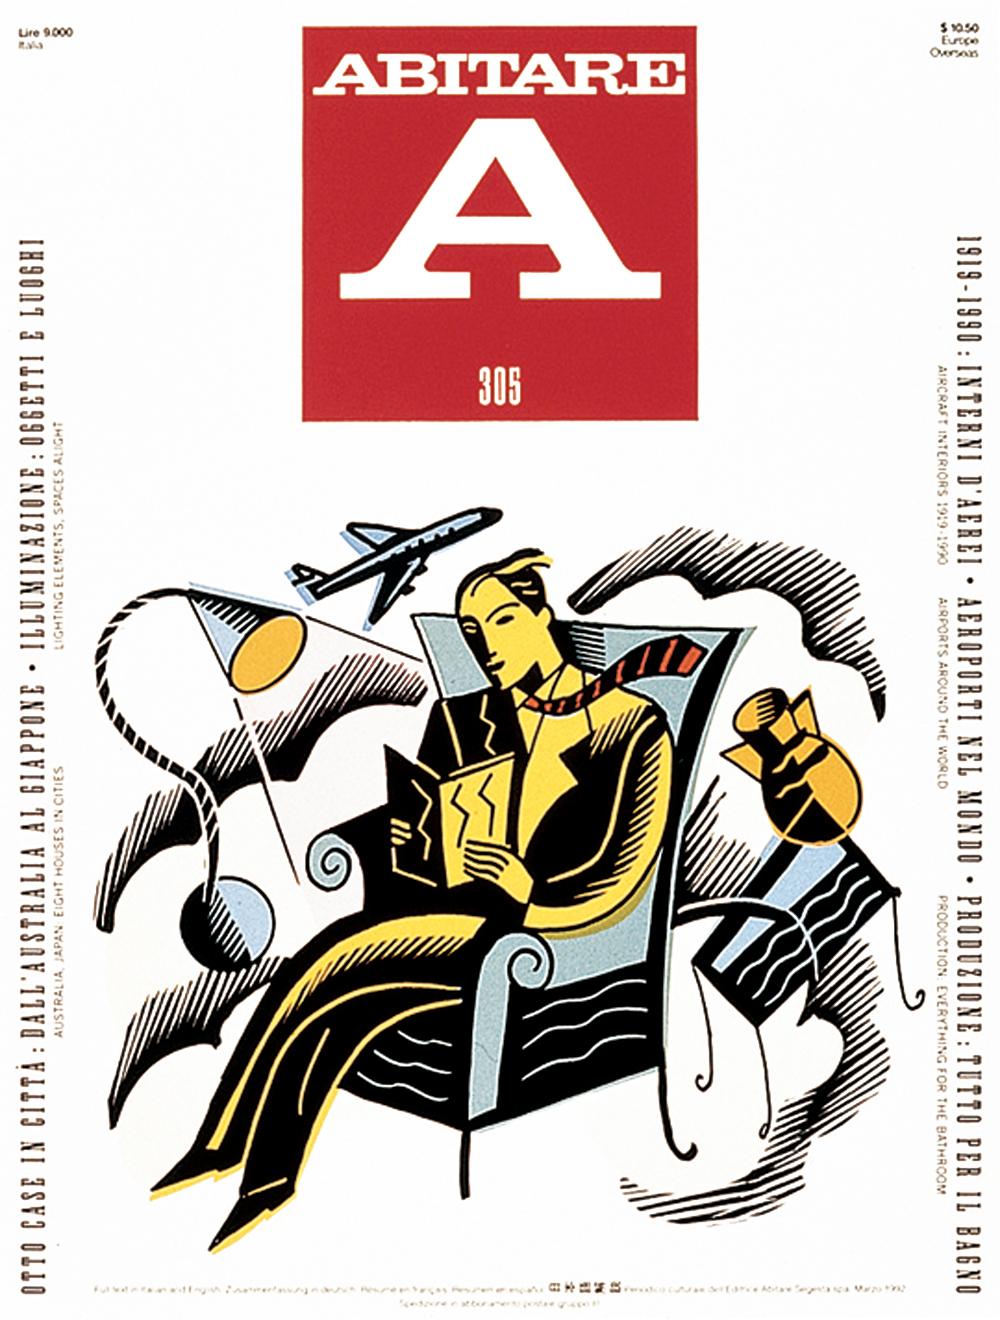 Abitare, n. 305, 1992.